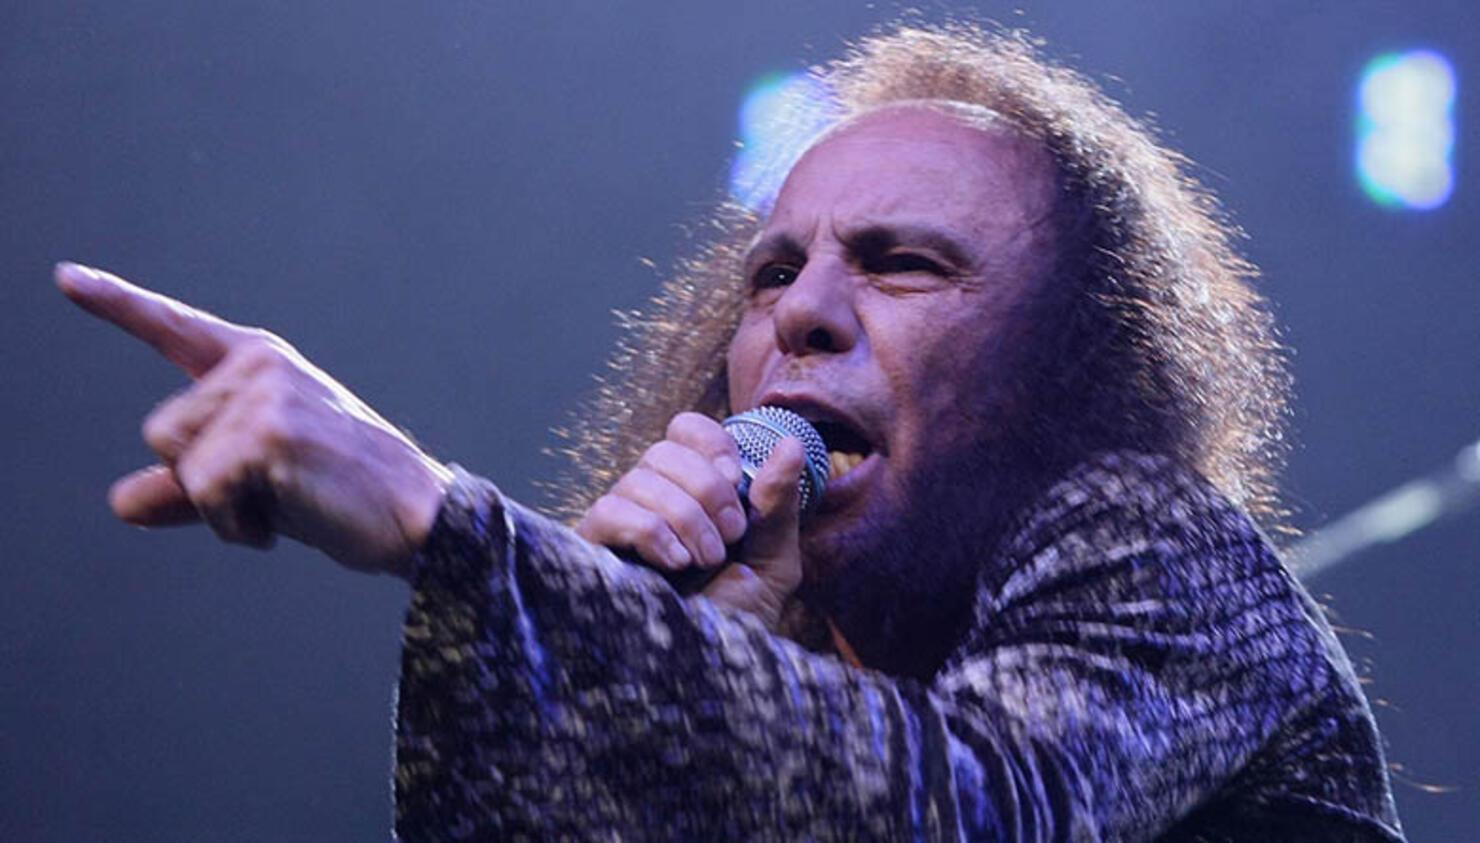 Ronnie James Dio Hologram Creator Blasts 'Selfish' Critics